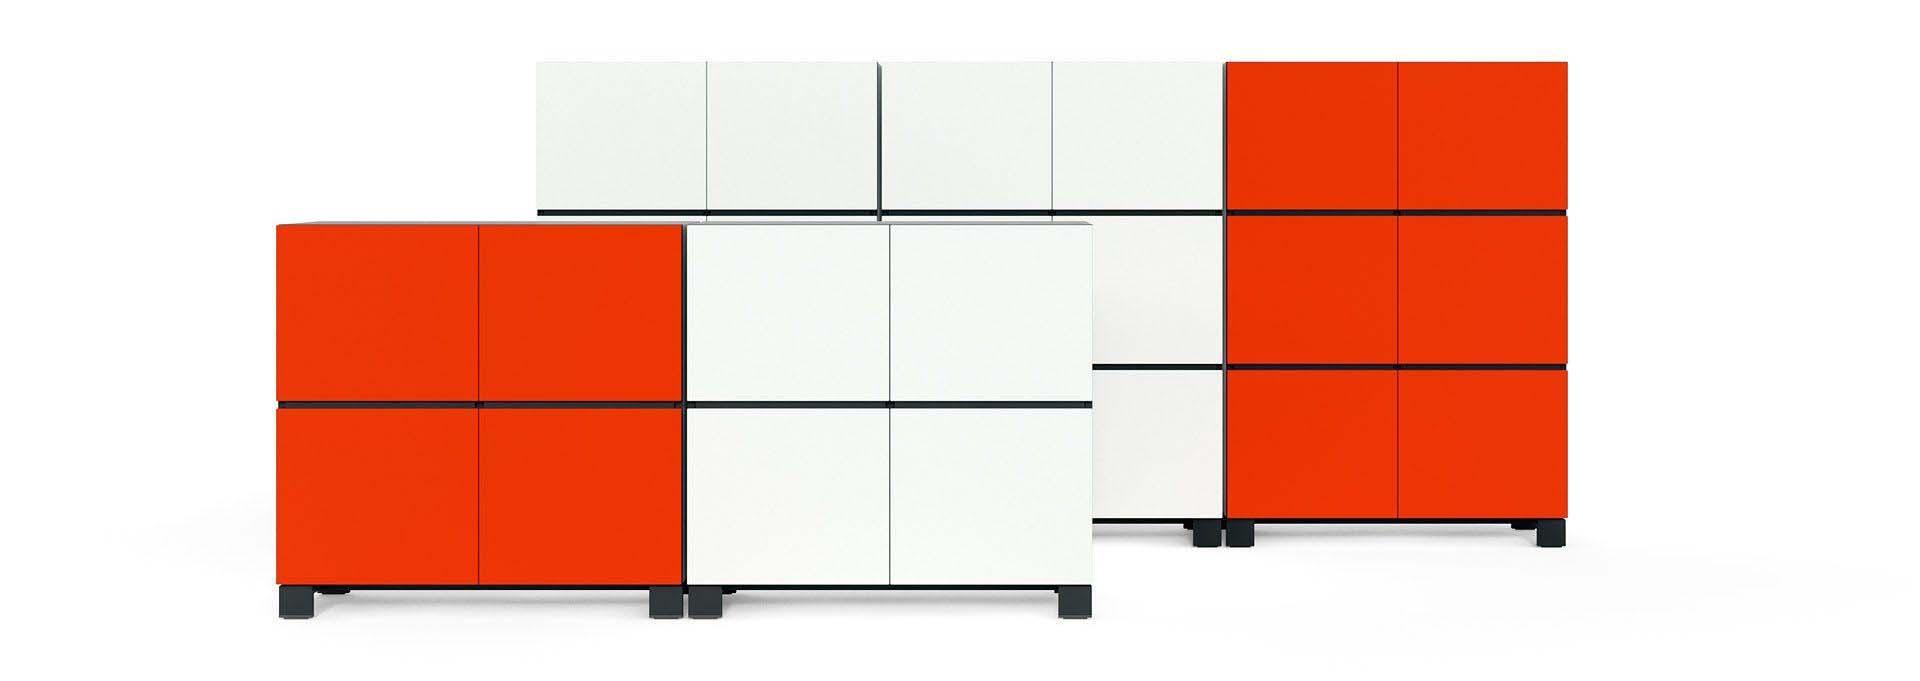 Storage-cabinets-JAZZ-Narbutas-1920x864